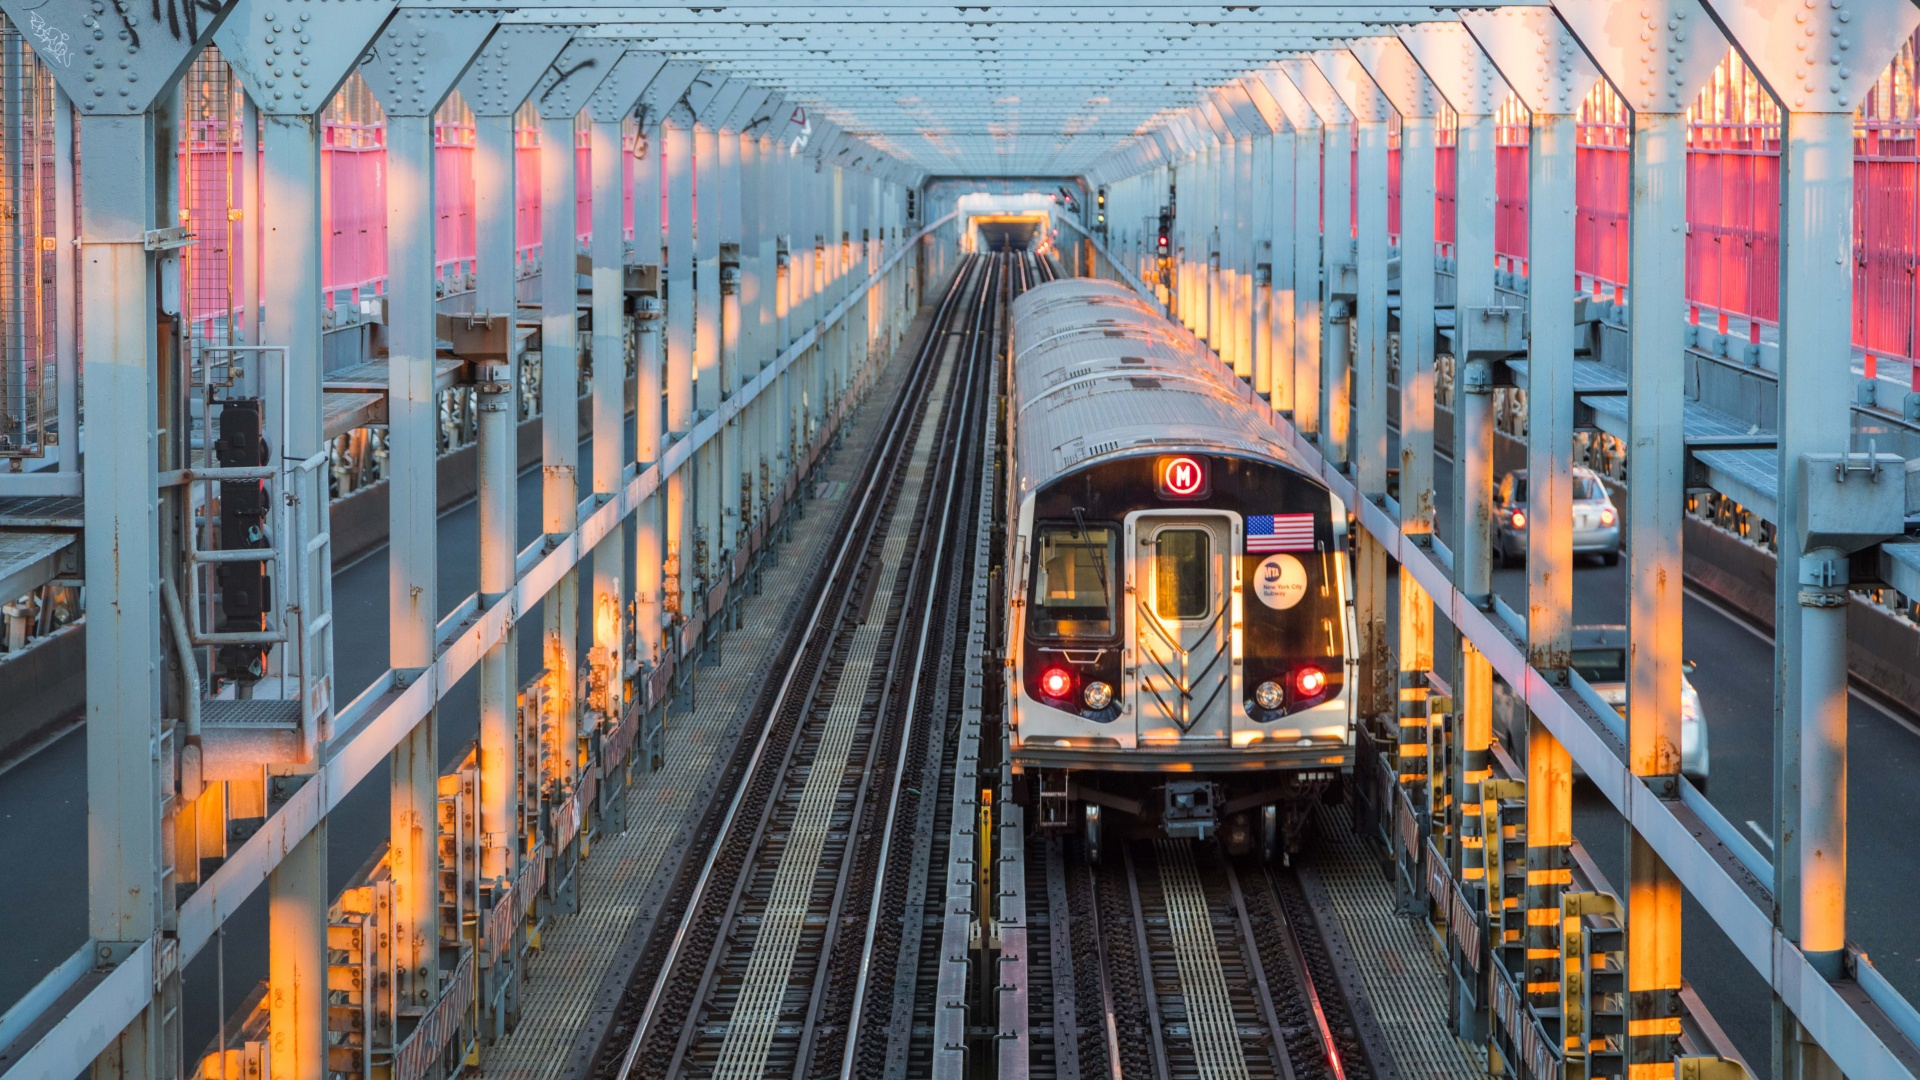 Greenpoint and Williamsburg: train coming over Williamsburg Bridge